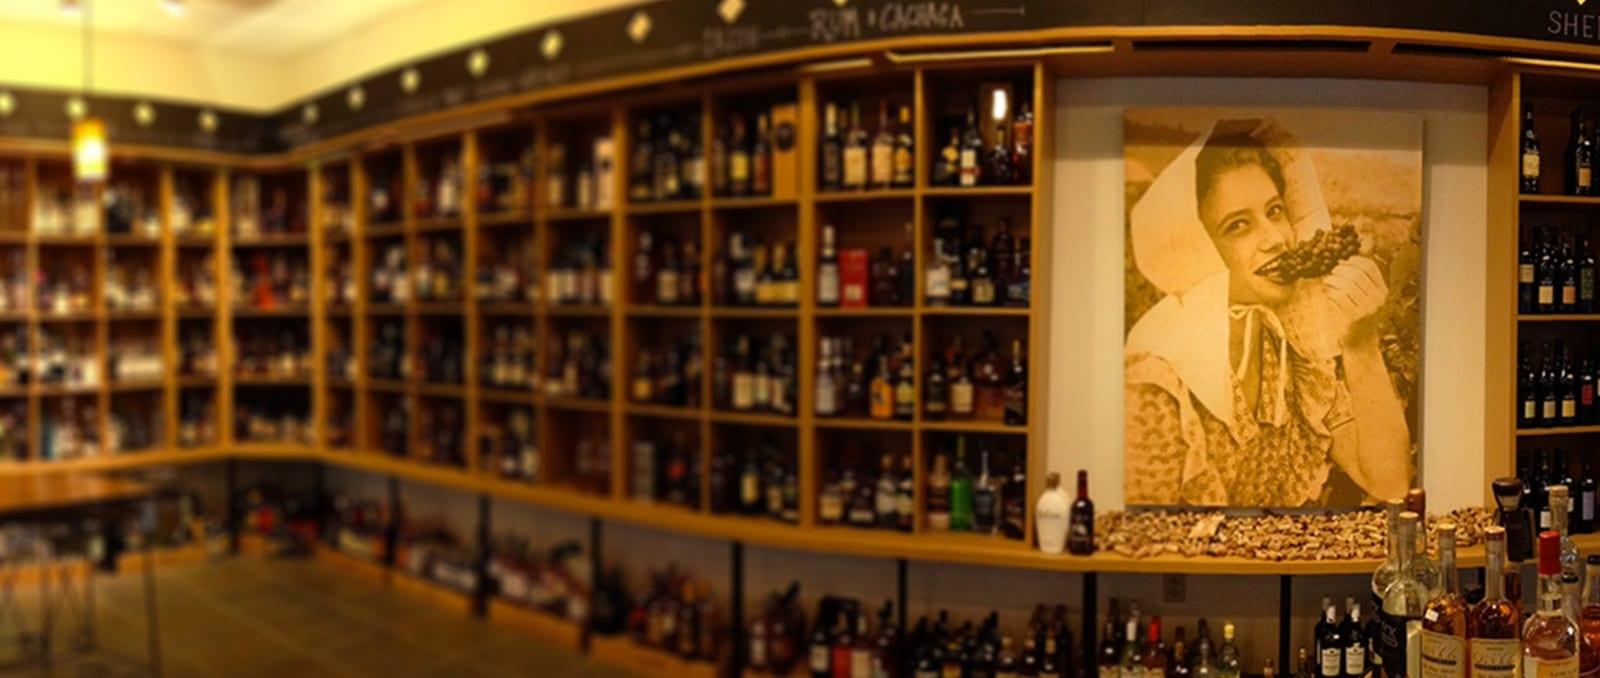 The Wine Thief - Fine Wines • Specialty Beers • Premium Liquors